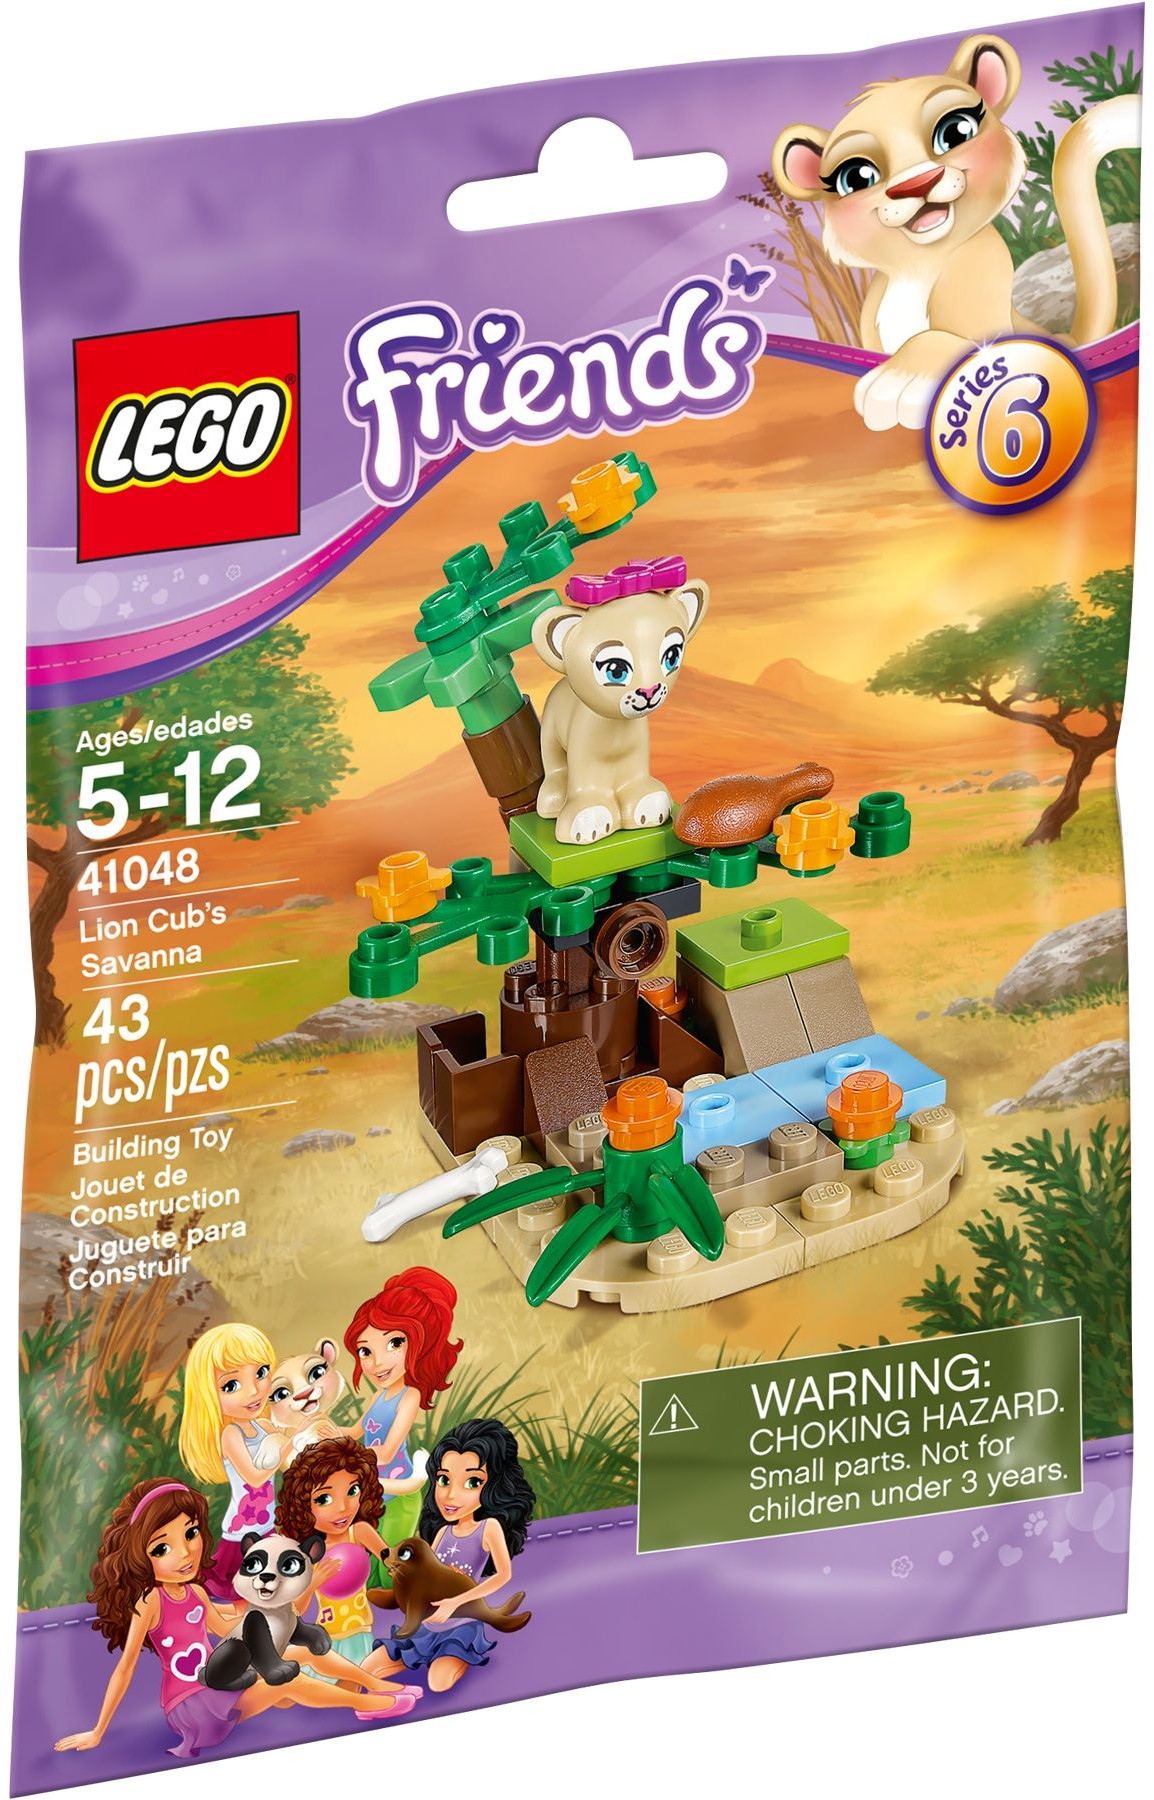 Lego 41048 Lion Cub's Savanna